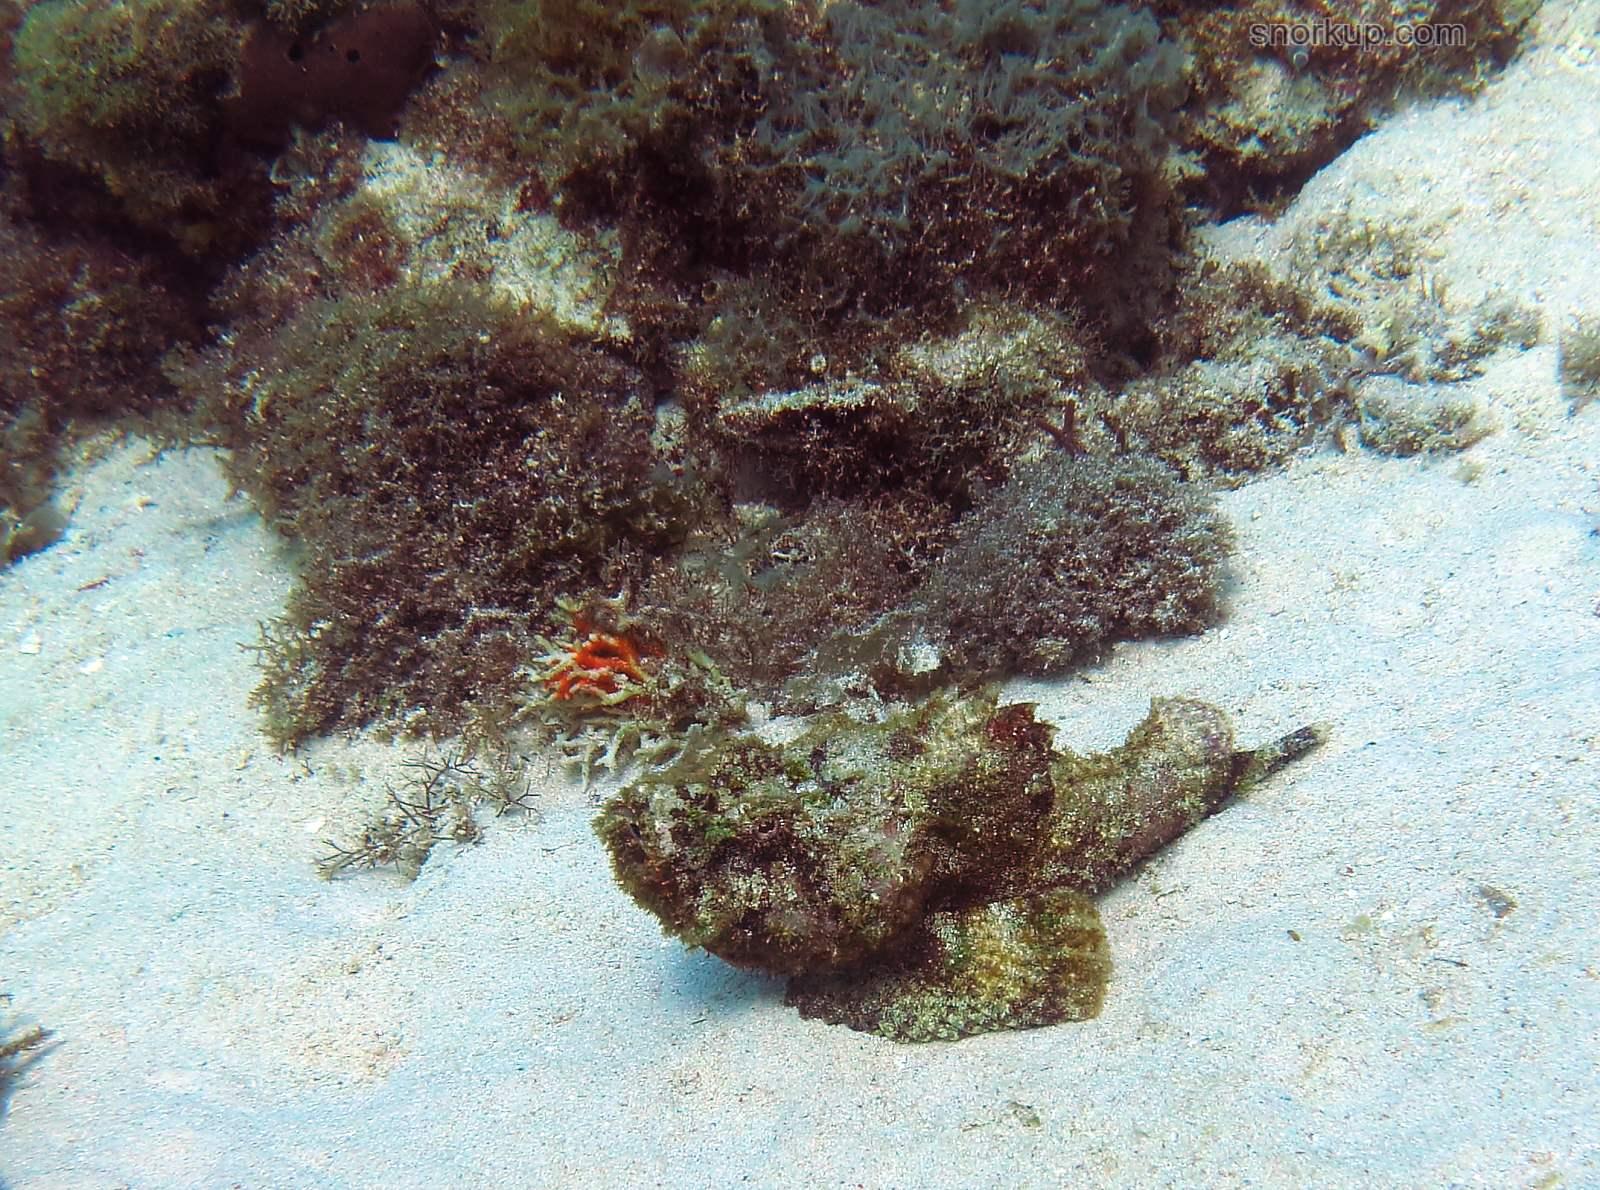 Ложная бородавчатка или дъявольский скорпенопс, лат.Scorpaenopsis diabolus, анг.Devil scorpionfish - поначалу принял за Рыбу-камень (Synanceia verrucosa)